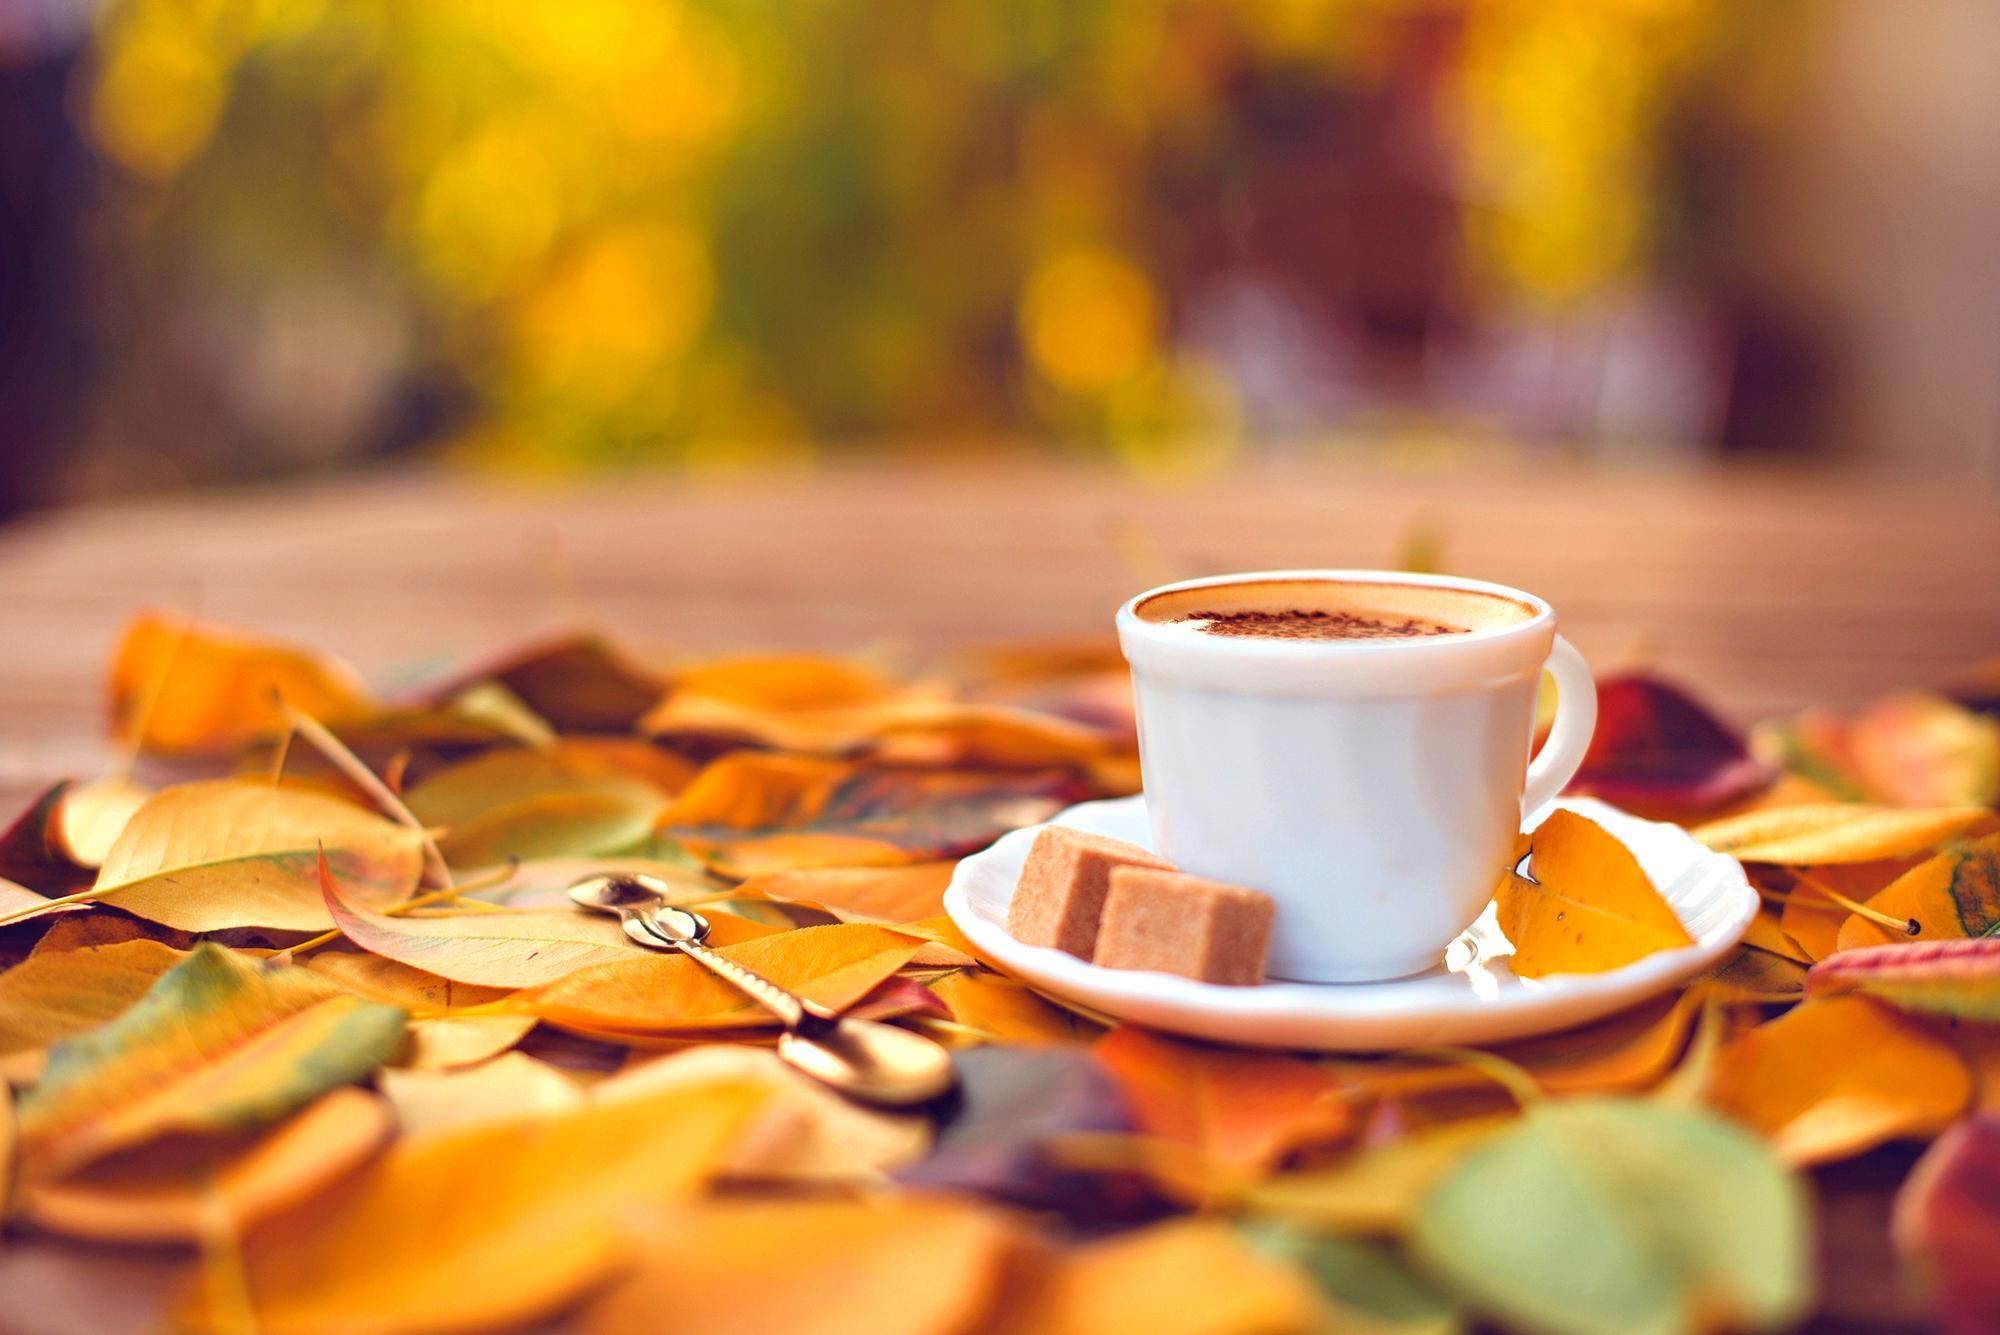 Halloween Fall Iphone Wallpaper Sweet Coffee And An Autumn Carpet Hd Wallpaper